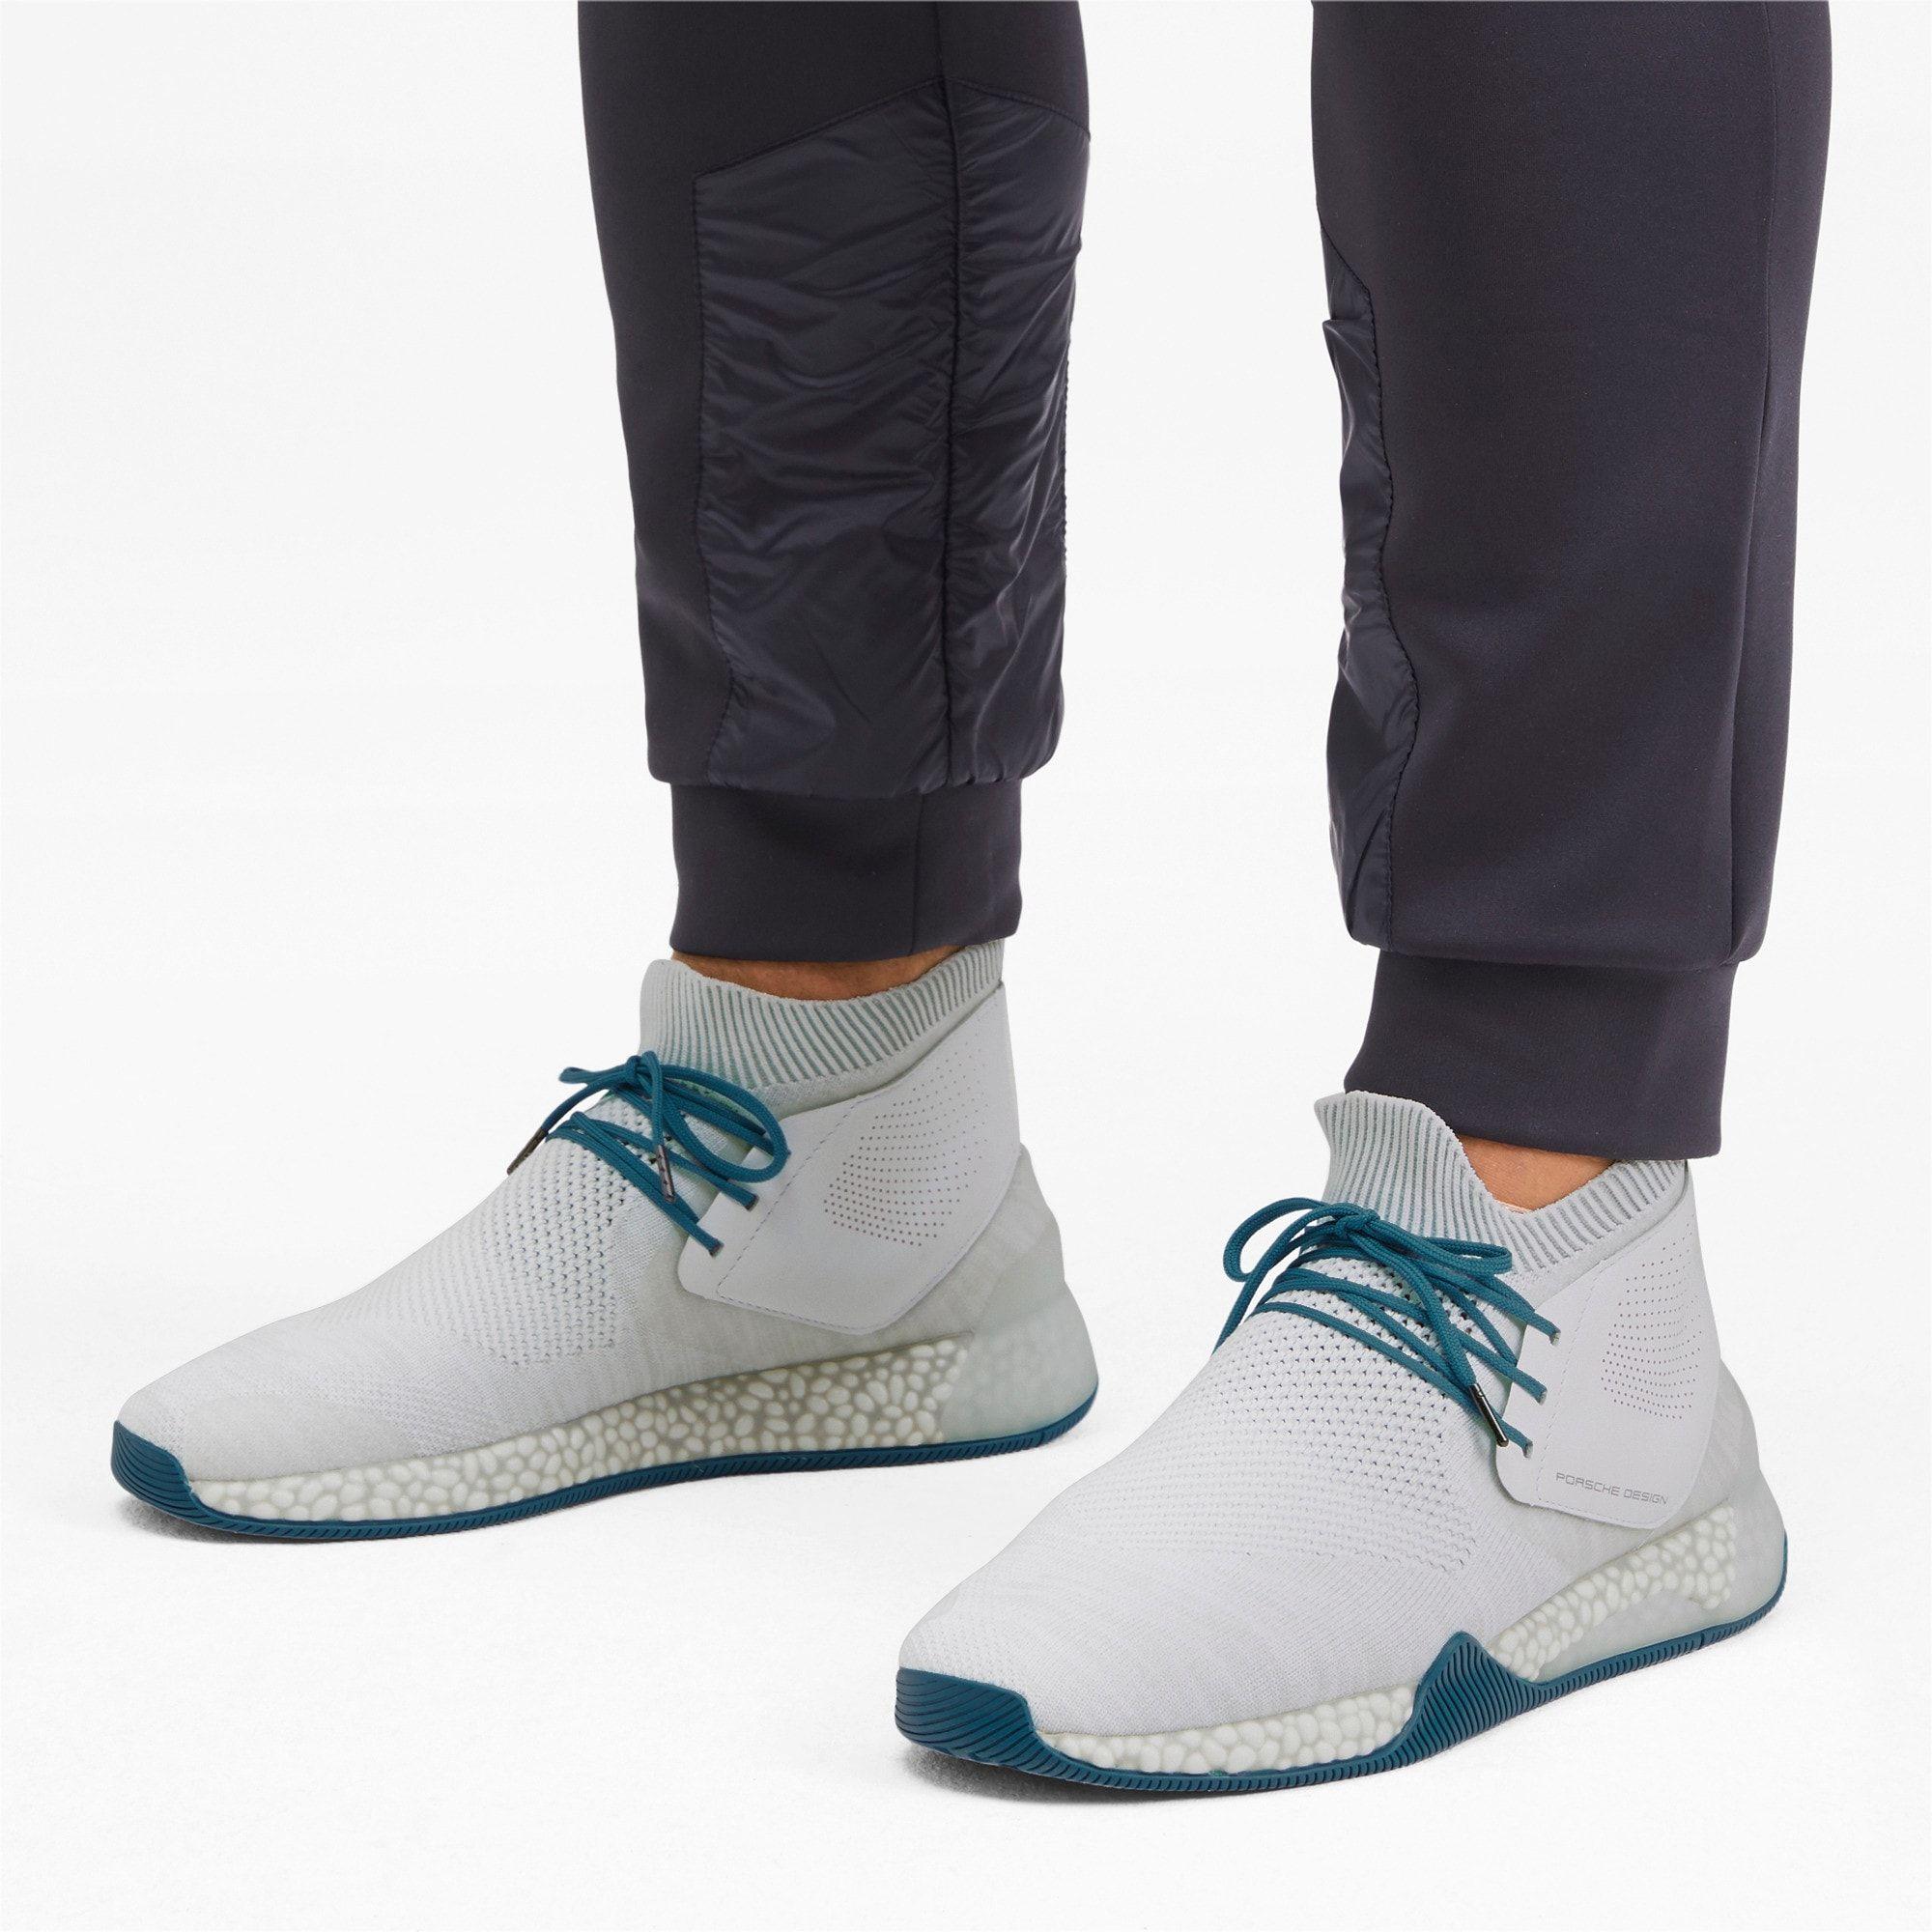 chaussure puma porsche